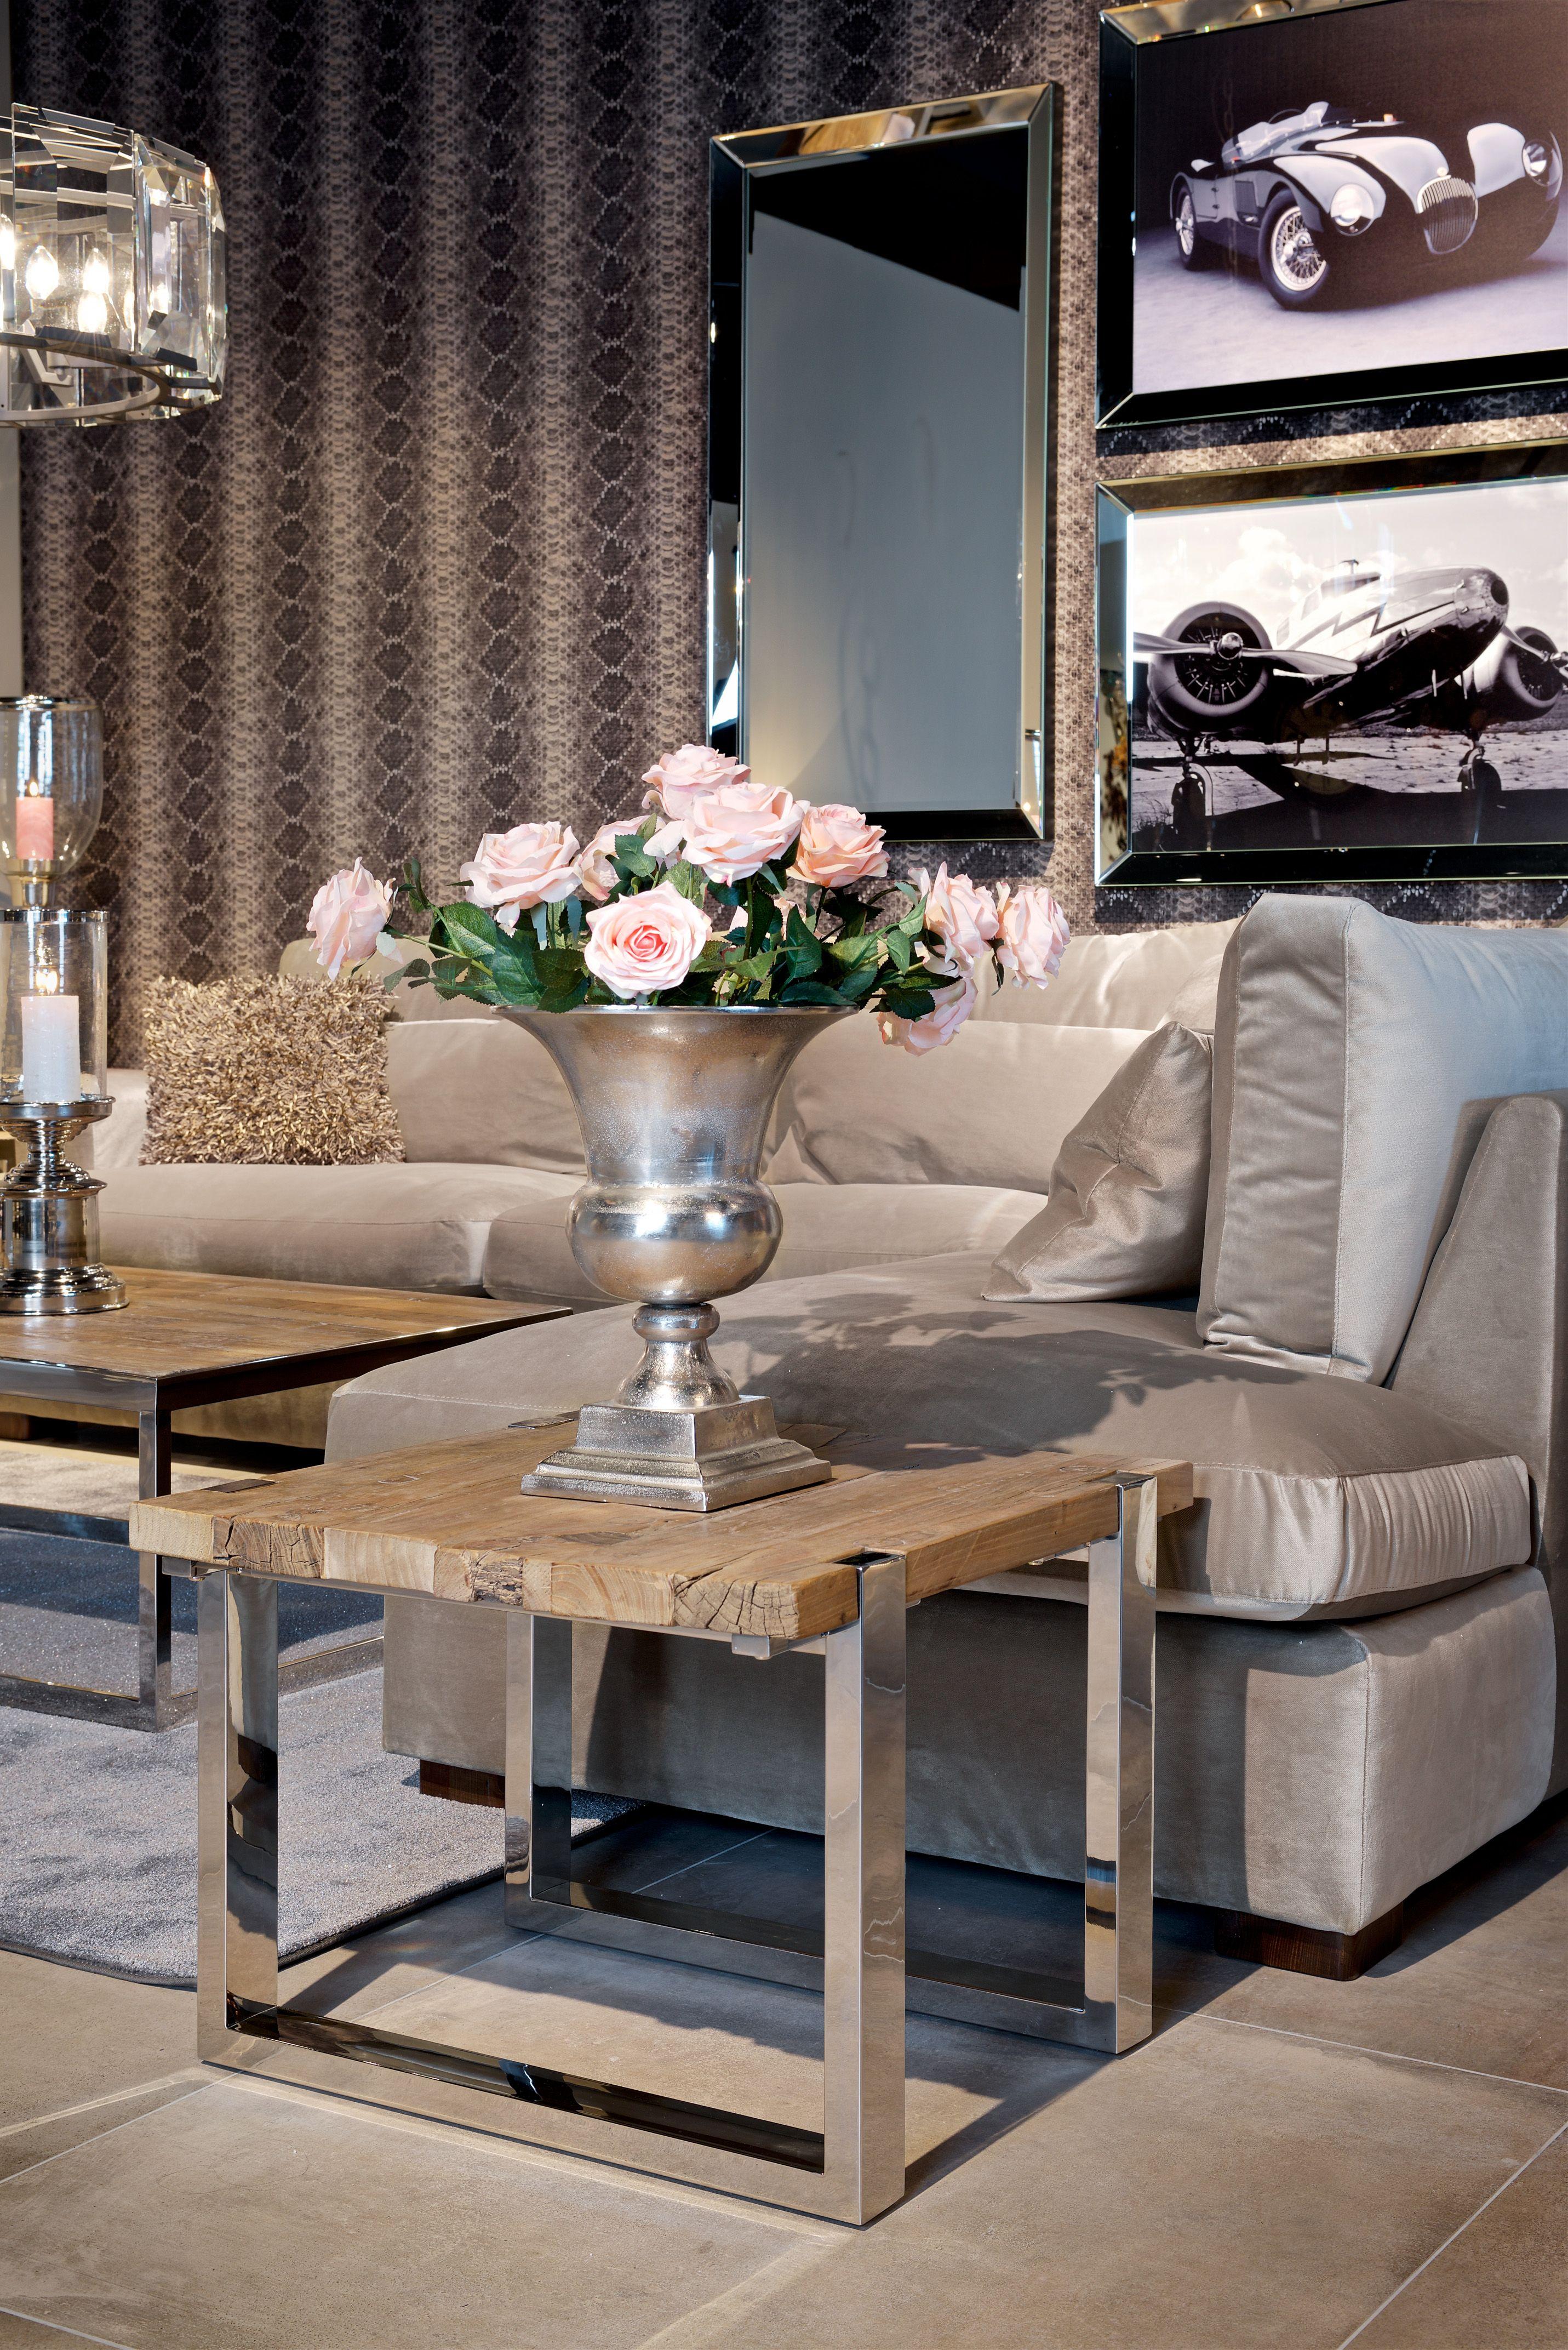 Pin By Alla Kashen On Richmond Interiors Richmond Interiors Coffee Table Home Decor